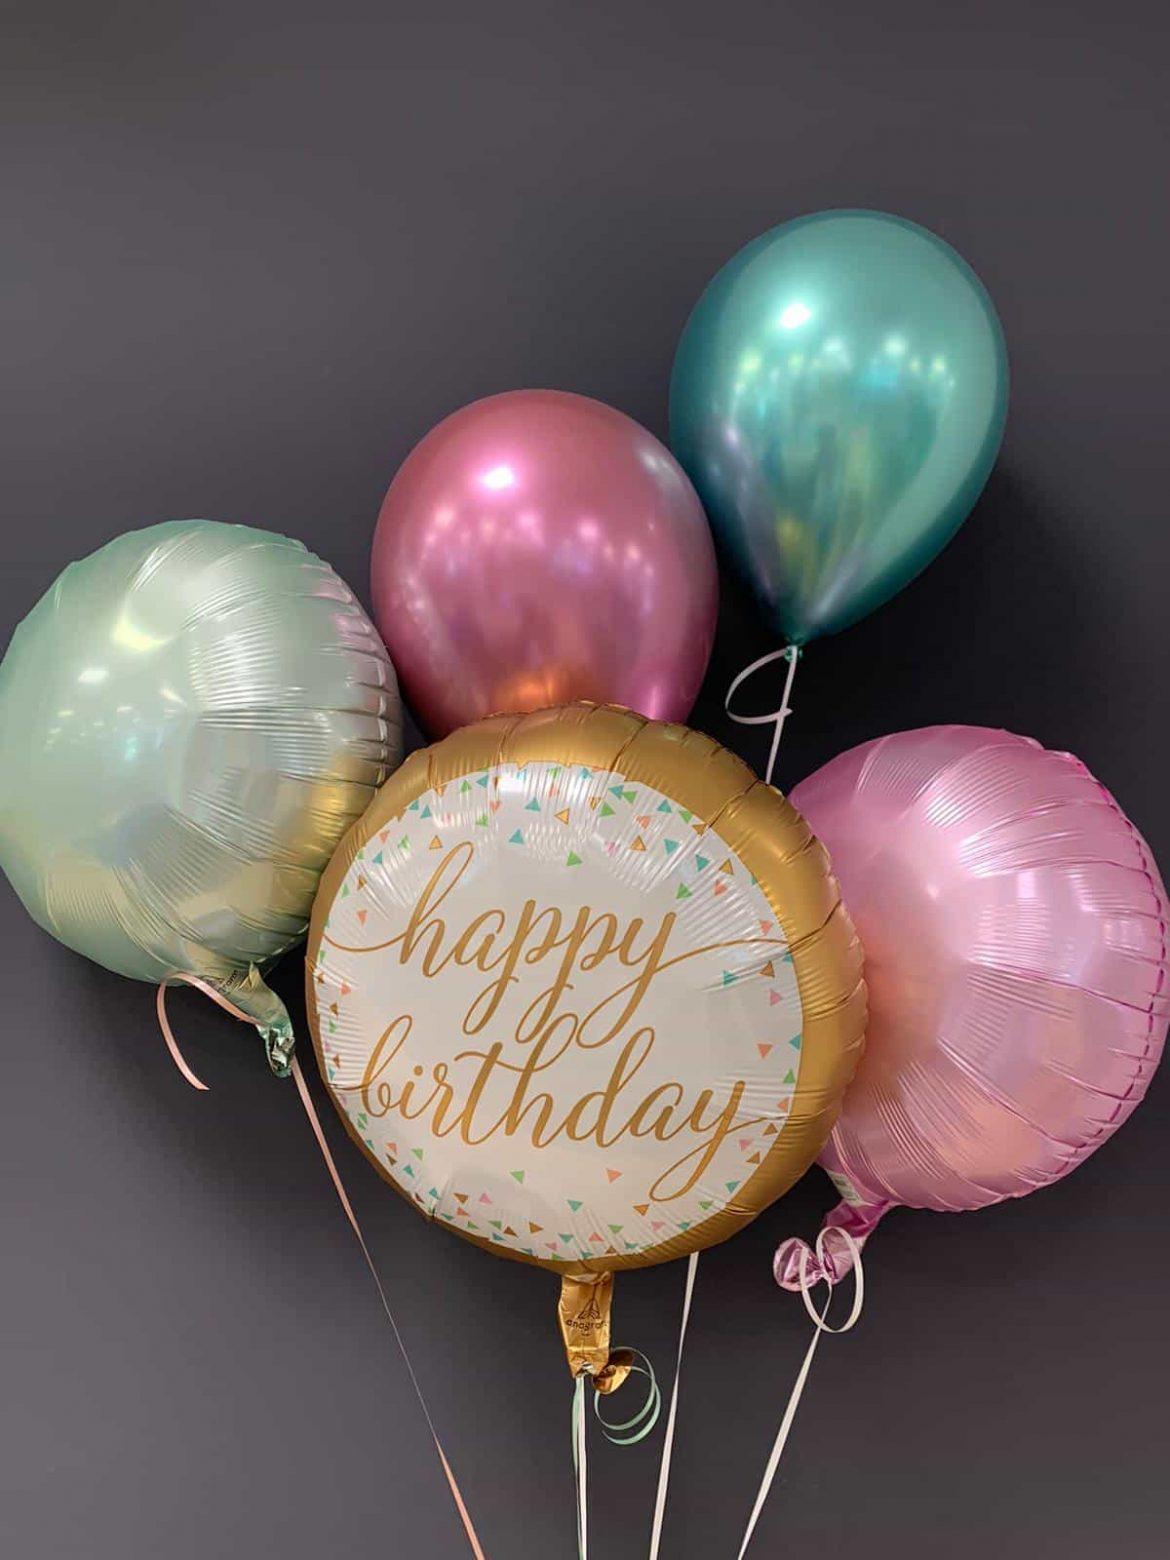 Happy Birthday € 5,50 <br />Dekoballons Folie € 4,50 <br />Chrome Latex € 2,30 1